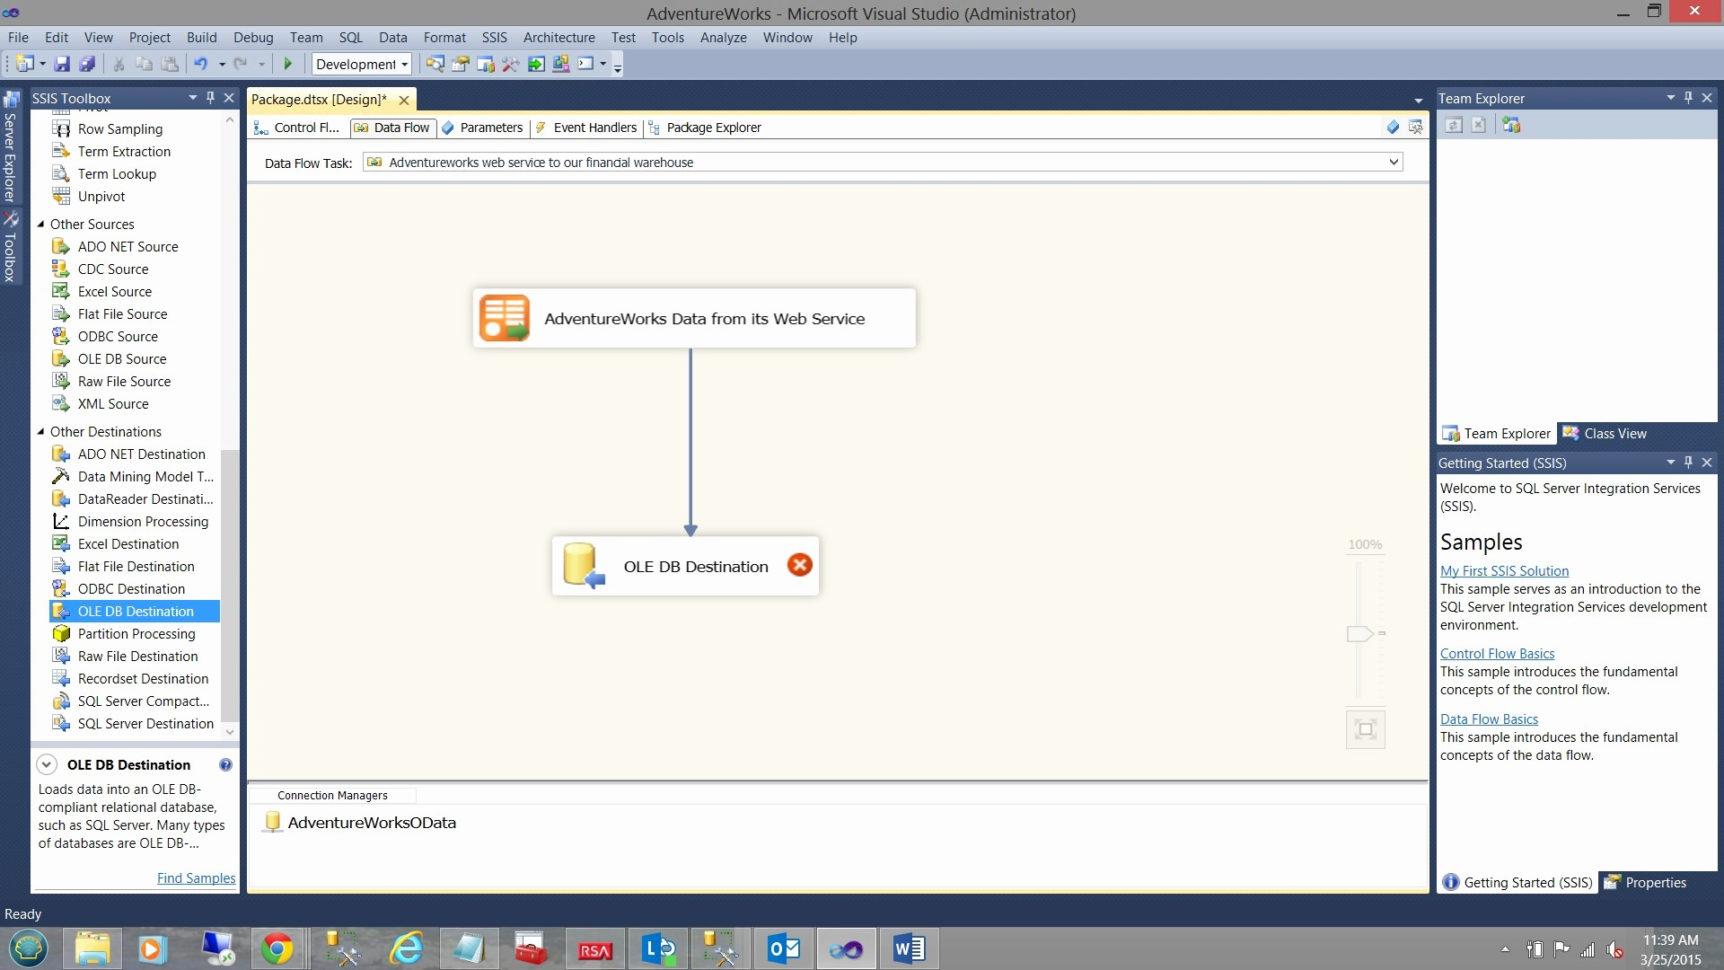 Turn Excel Spreadsheet Into Web Application Inside How To Turn An Excel Spreadsheet Into A Sophisticated Web App